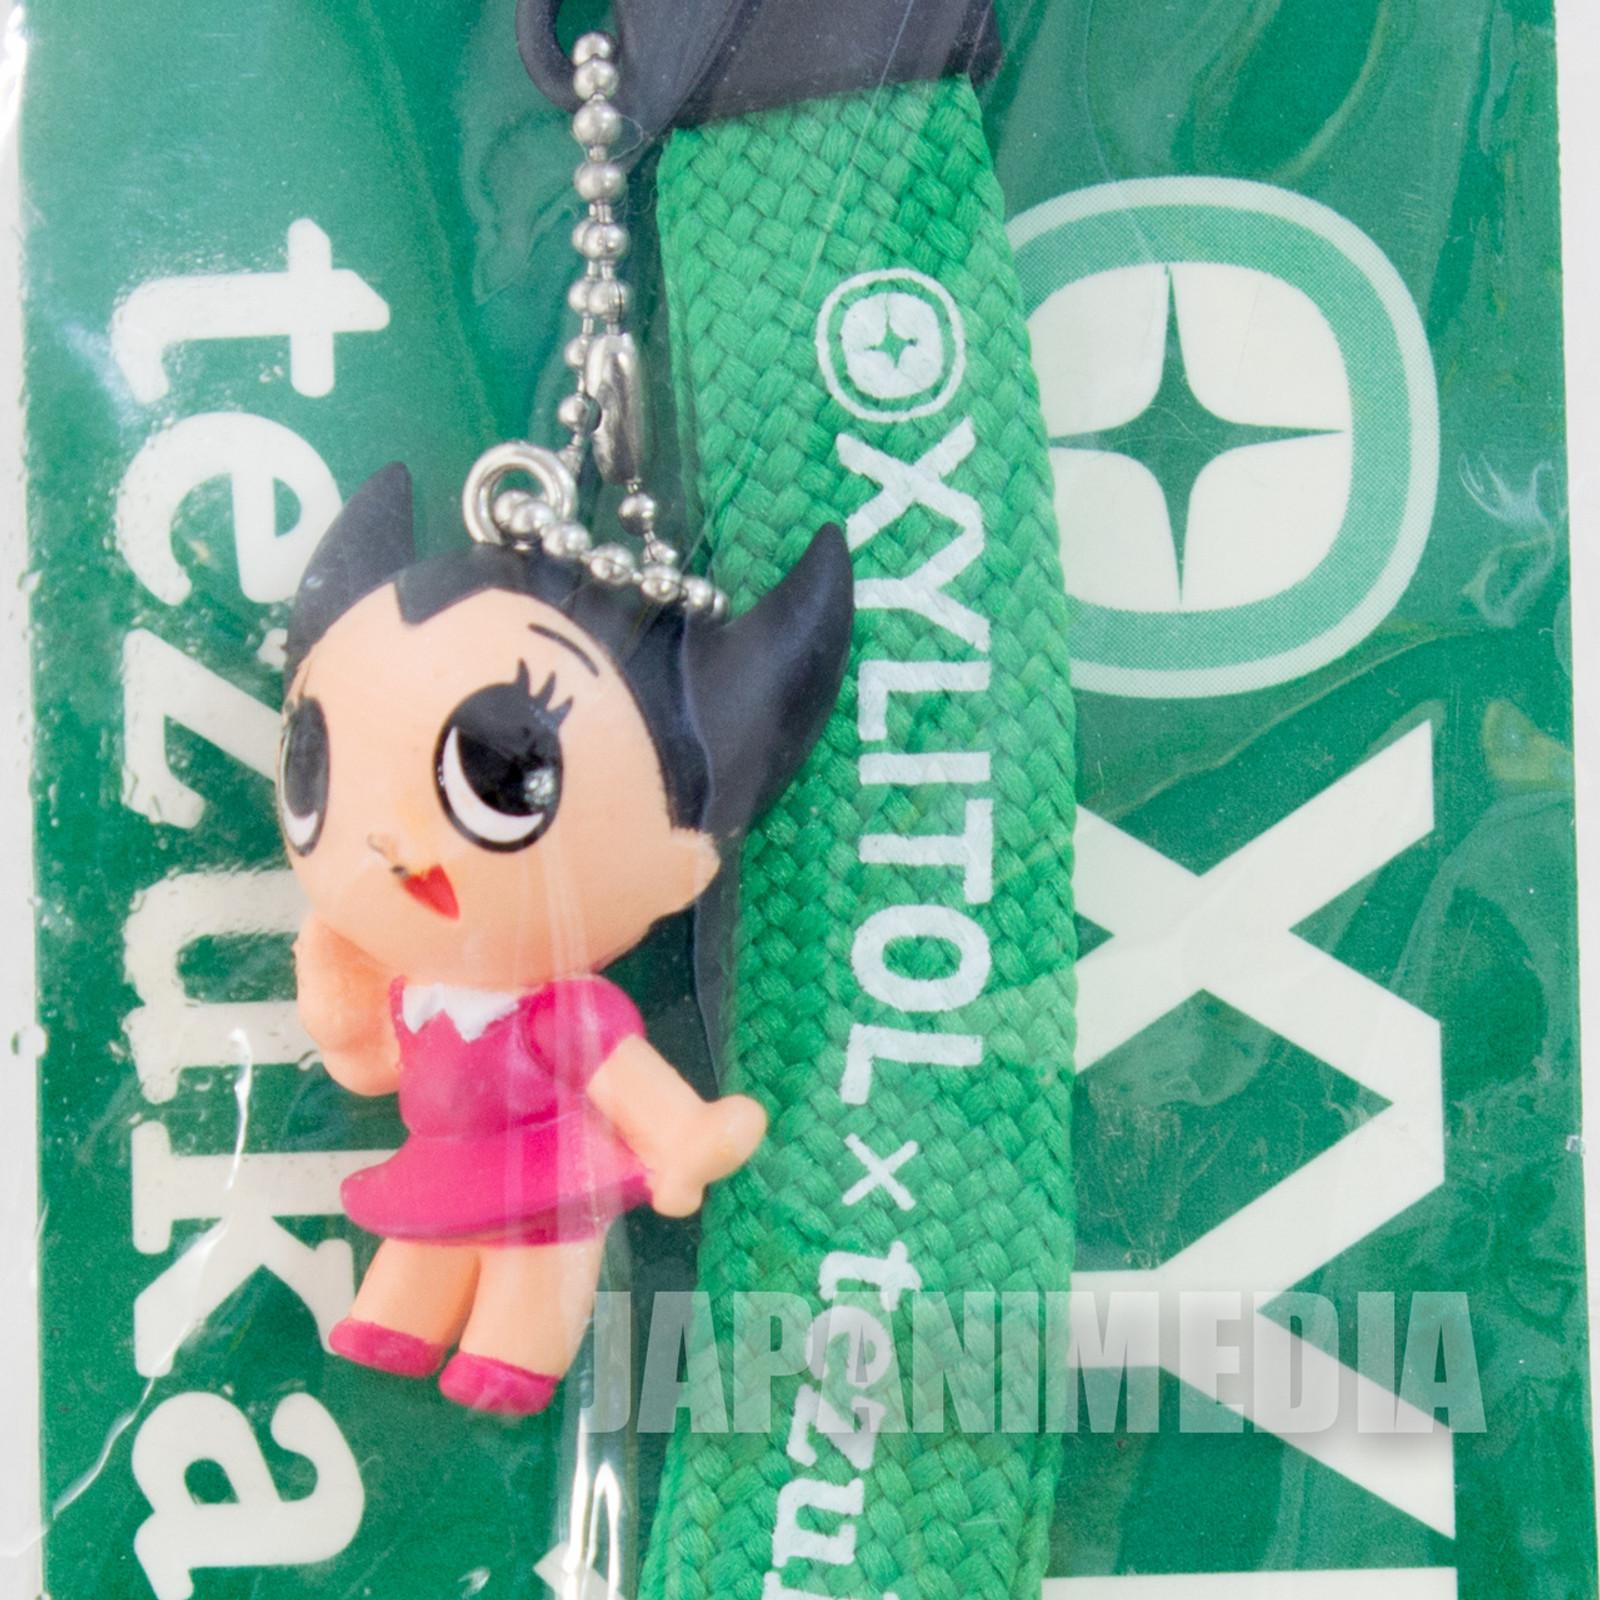 Astro Boy Uran Mascot Figure Strap XYLITOL 10th Anniversary Tezuka Osamu